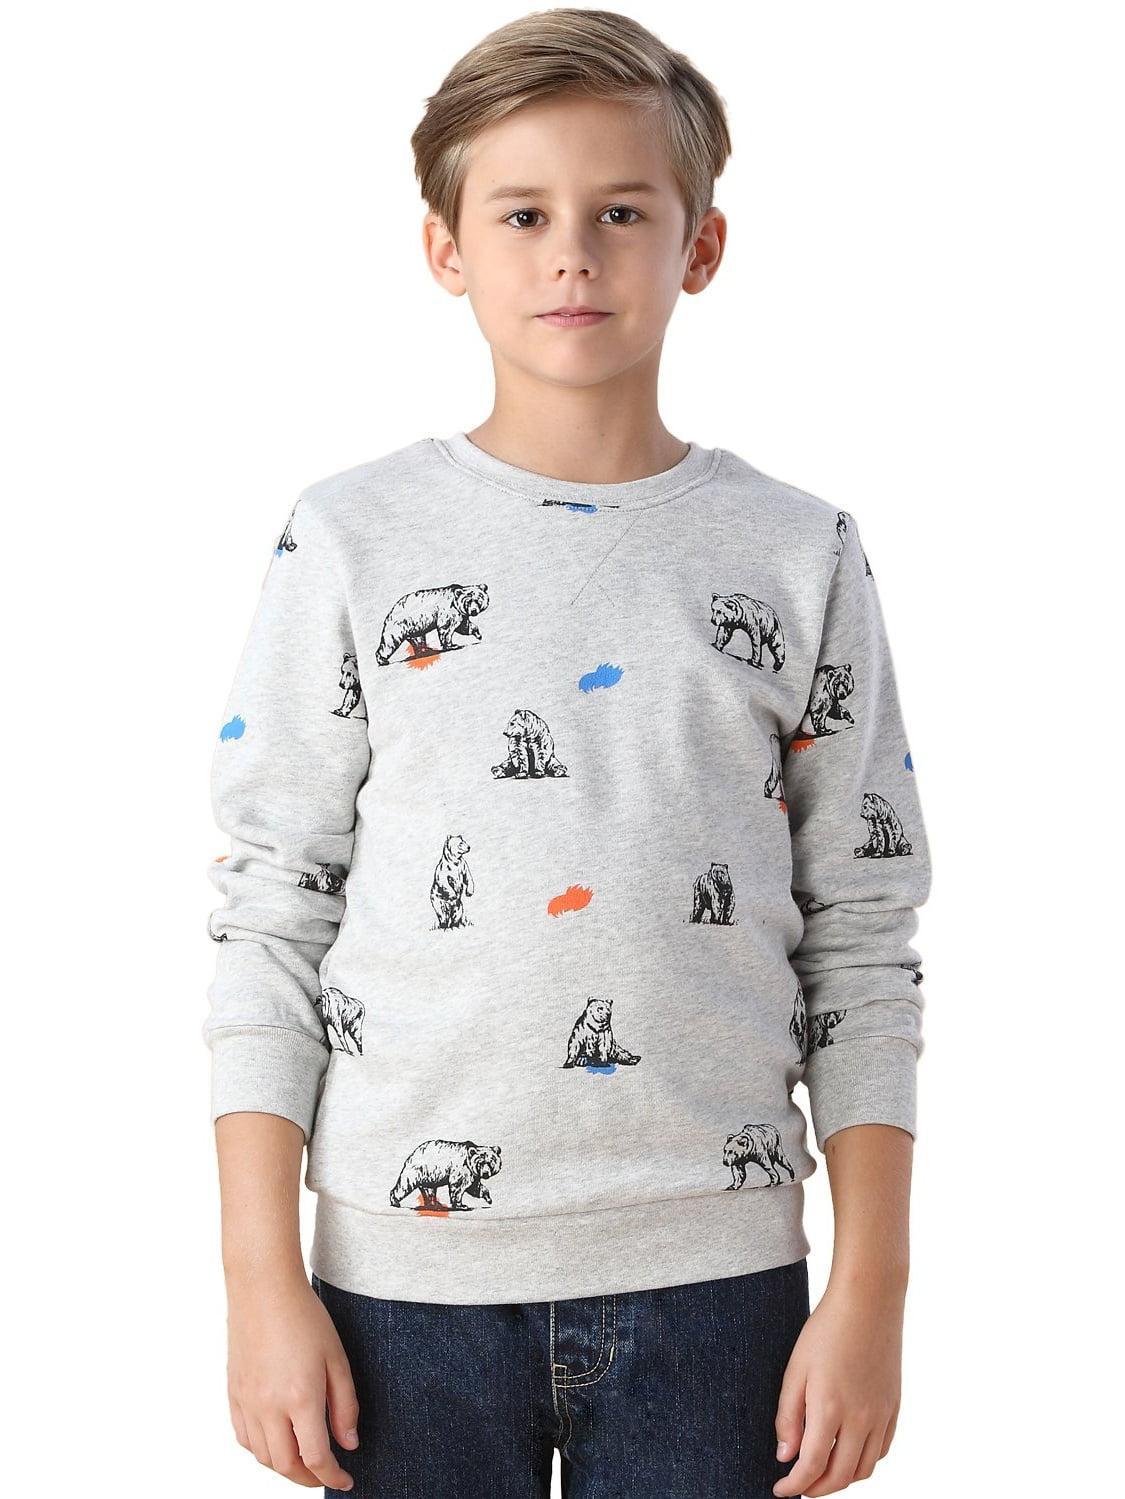 Leo&Lily Boys' Polar Bear Print Fleece Sweatshirts T-Shirt